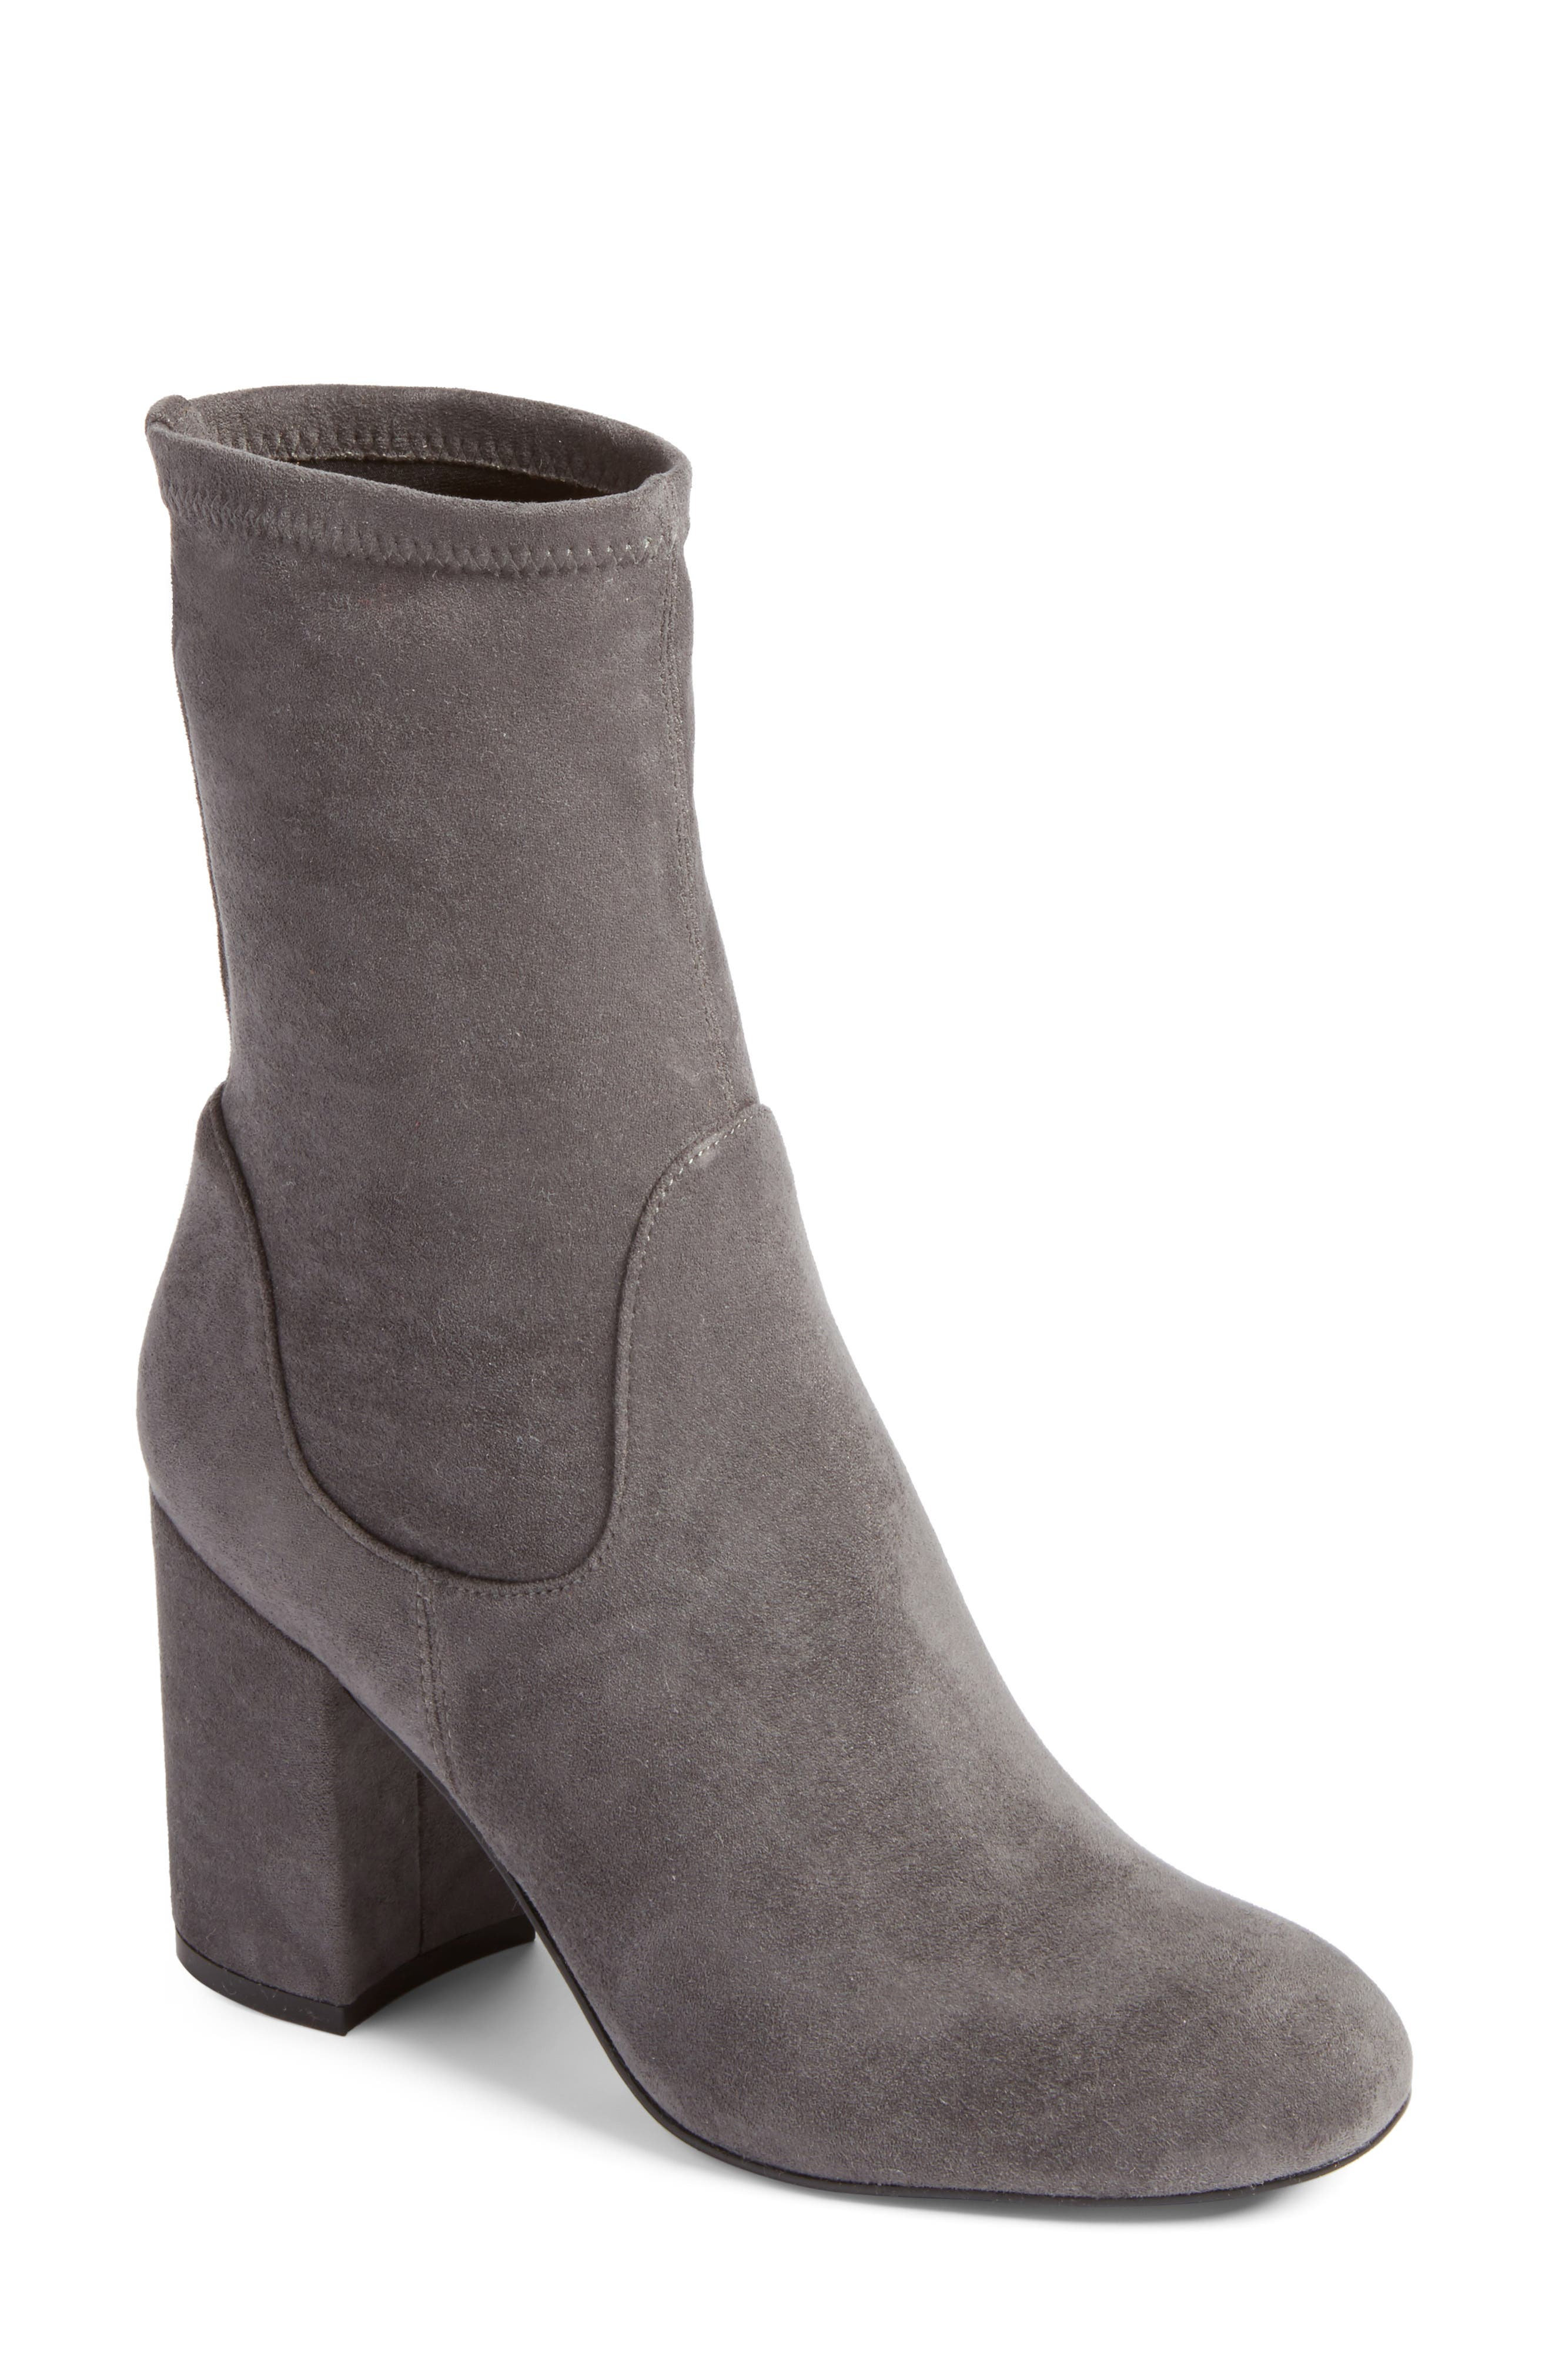 Alternate Image 1 Selected - Halogen® Jacy Stretch Sock Bootie (Women)